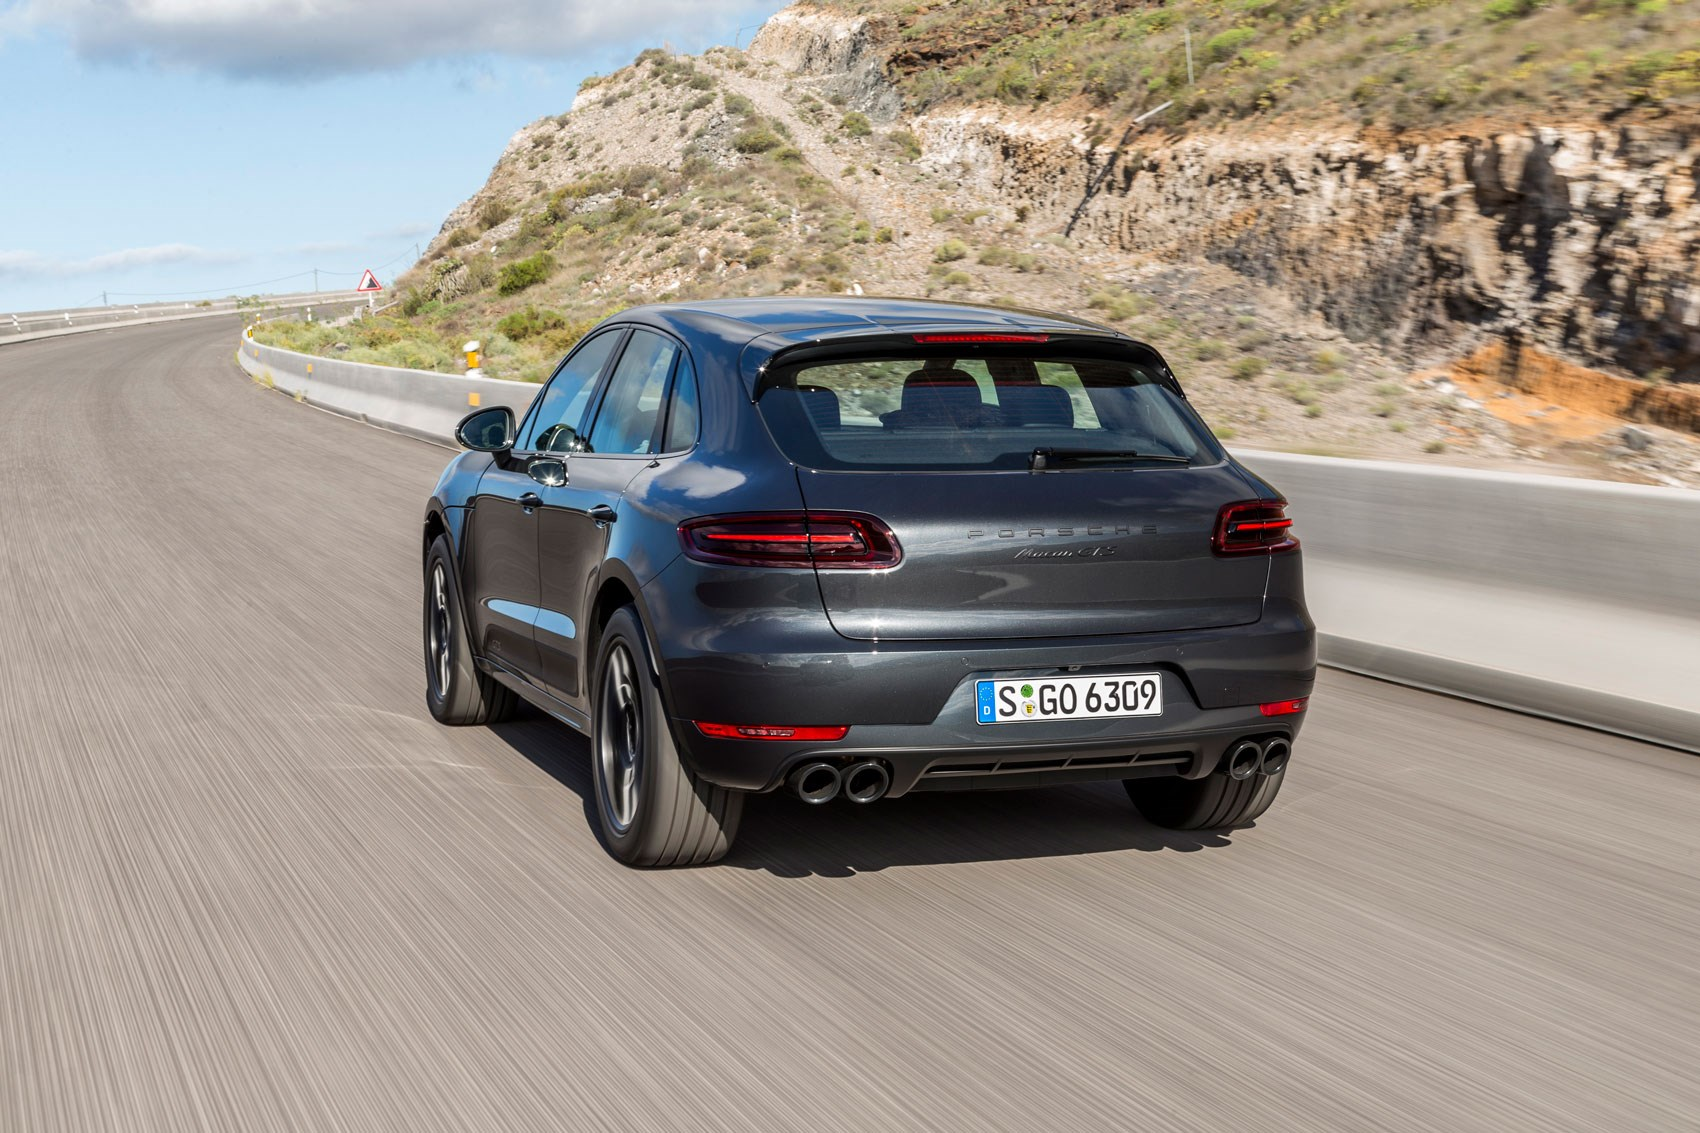 Porsche Macan Lease >> Porsche Macan GTS (2016) review by CAR Magazine